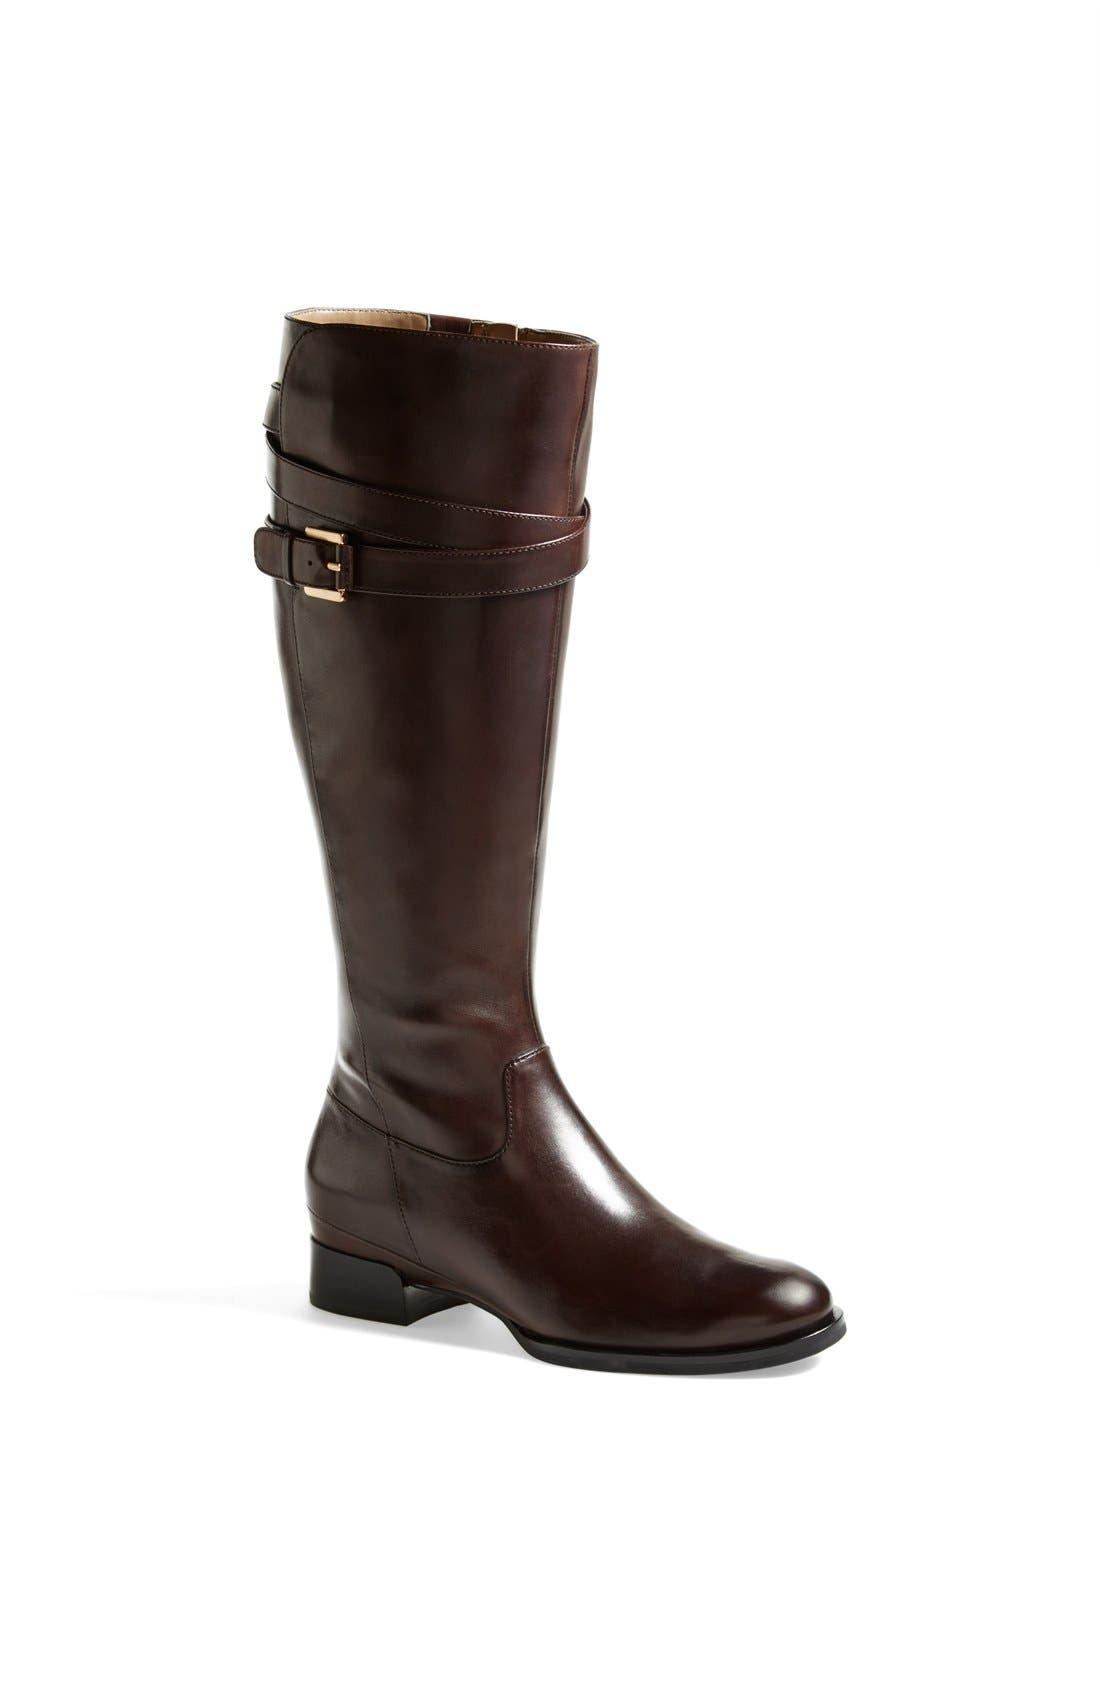 Main Image - ECCO 'Sullivan' Leather Boot (Women)